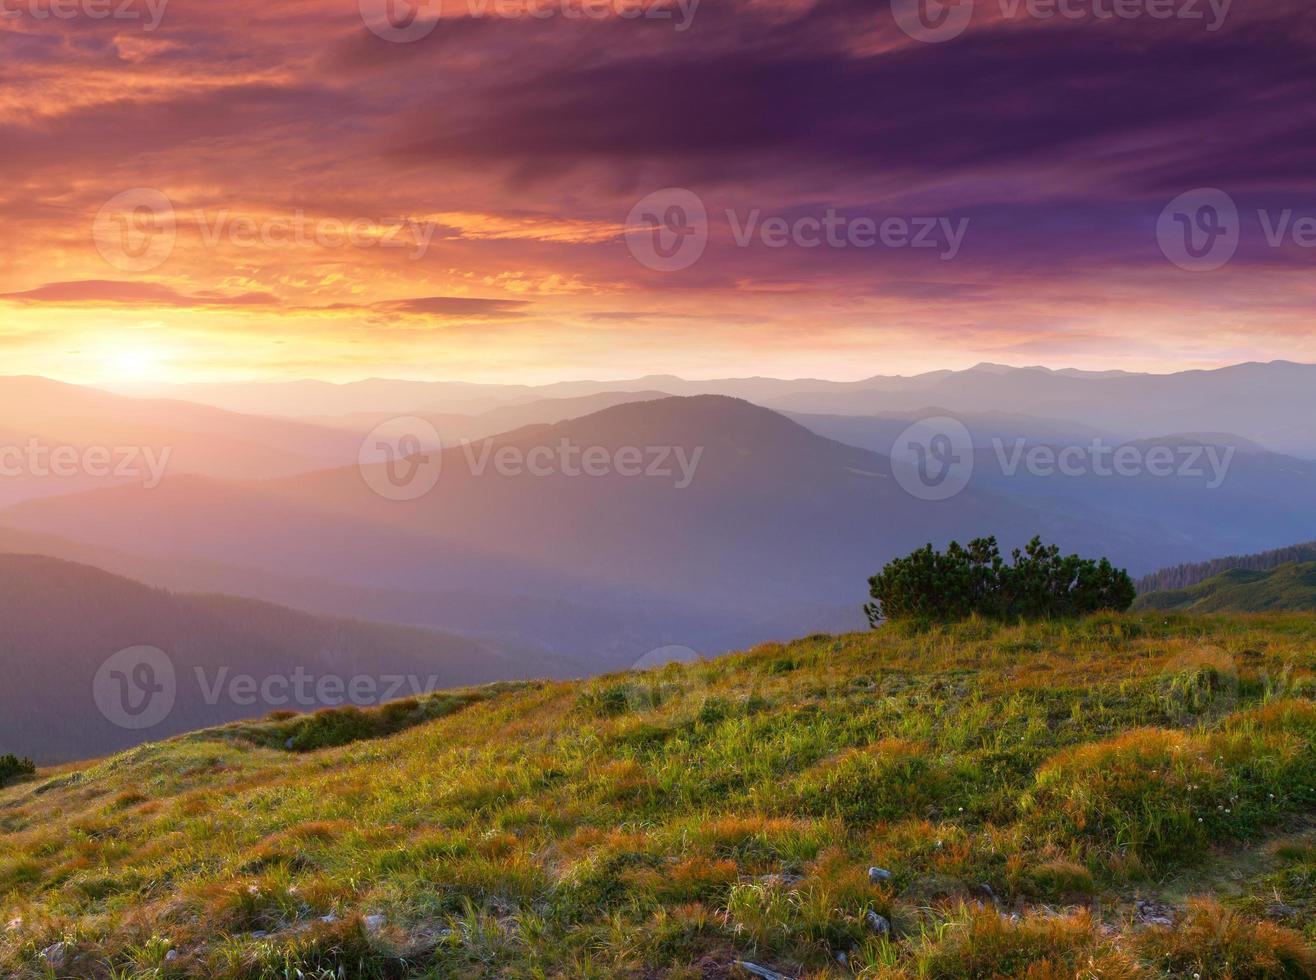 mooie zomerse landschap in de bergen. foto